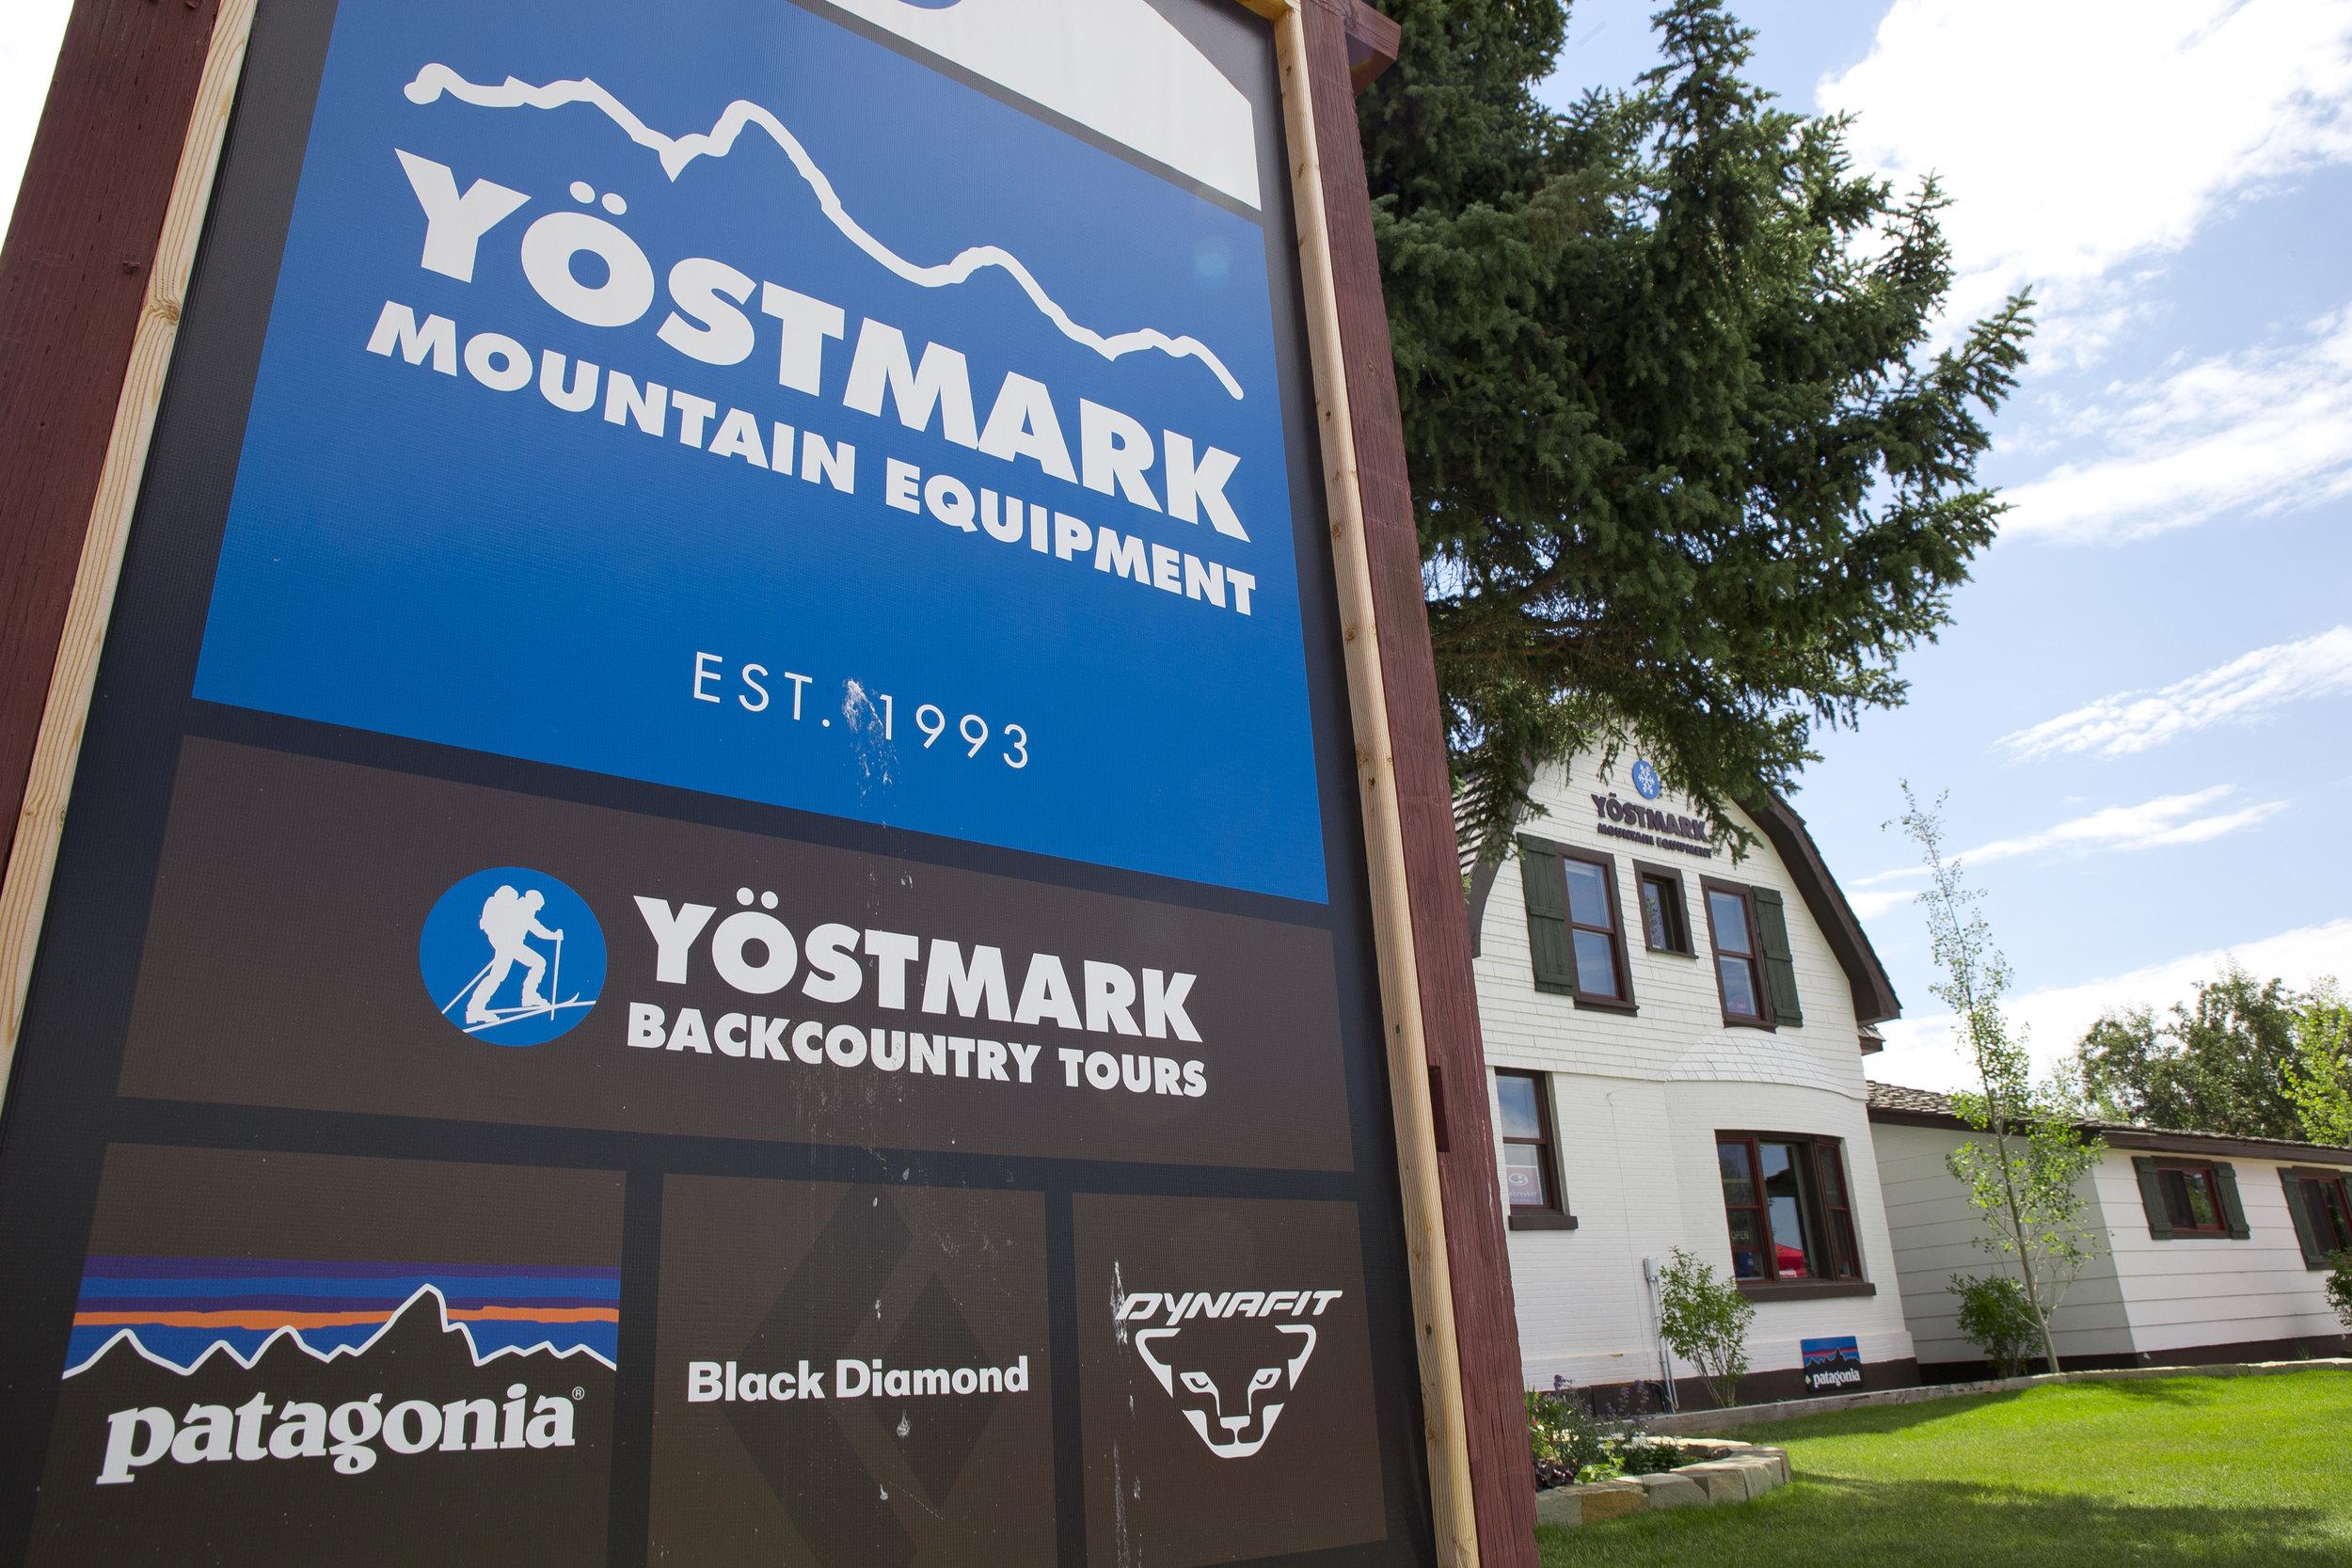 Driggs, ID - Yostmark Mountain Equipment: 1-208-354-2828